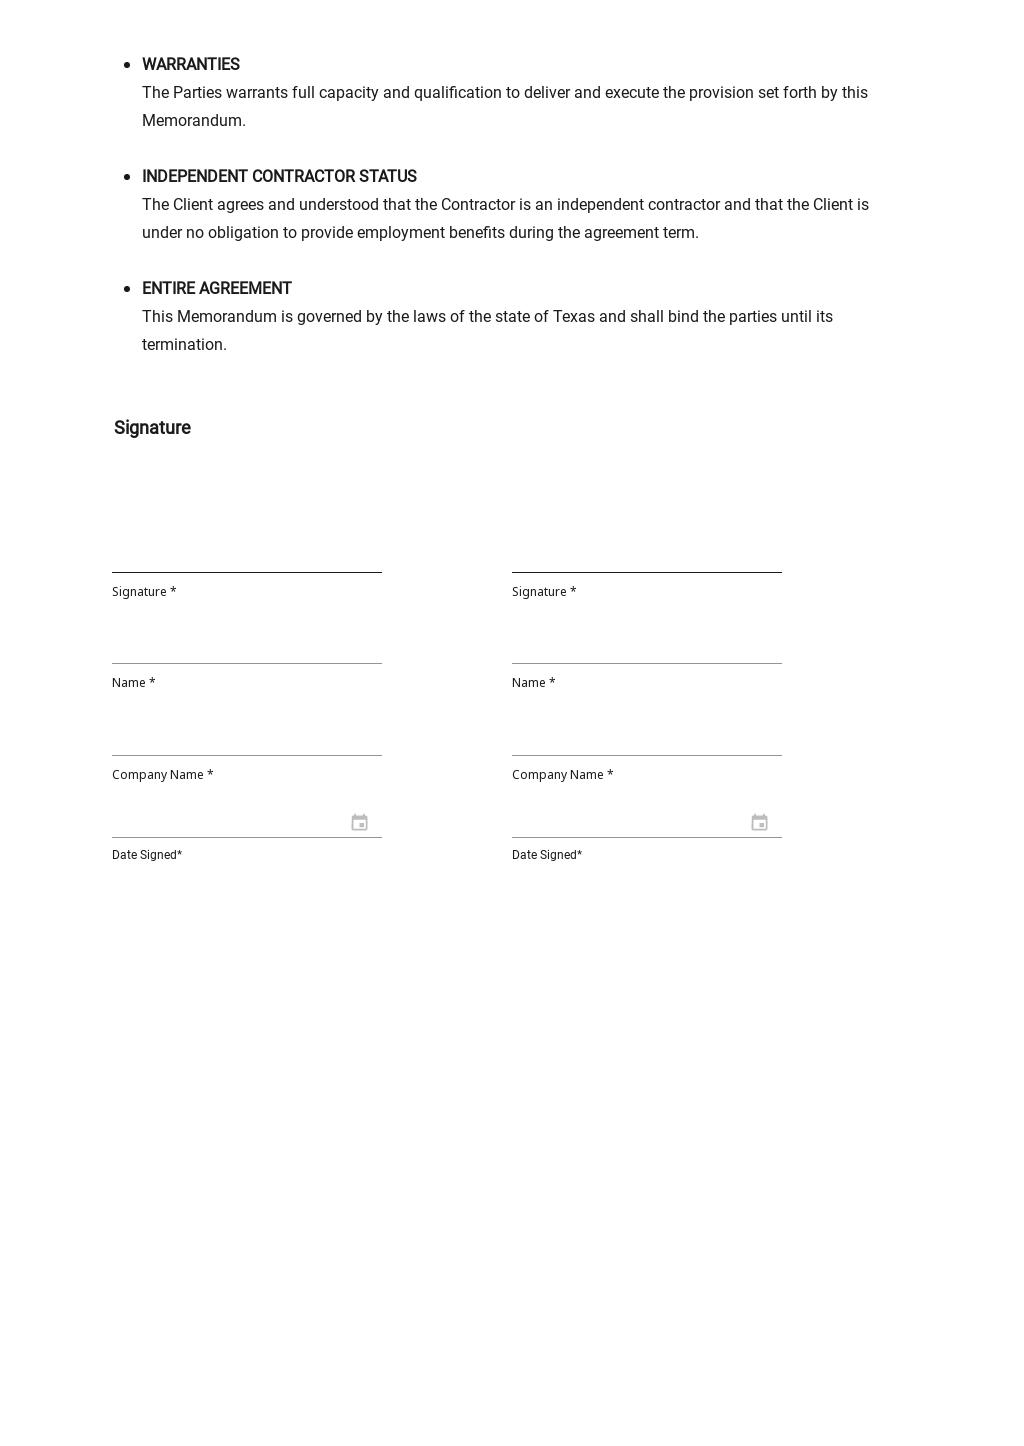 Sample Memorandum of Understanding Template 3.jpe